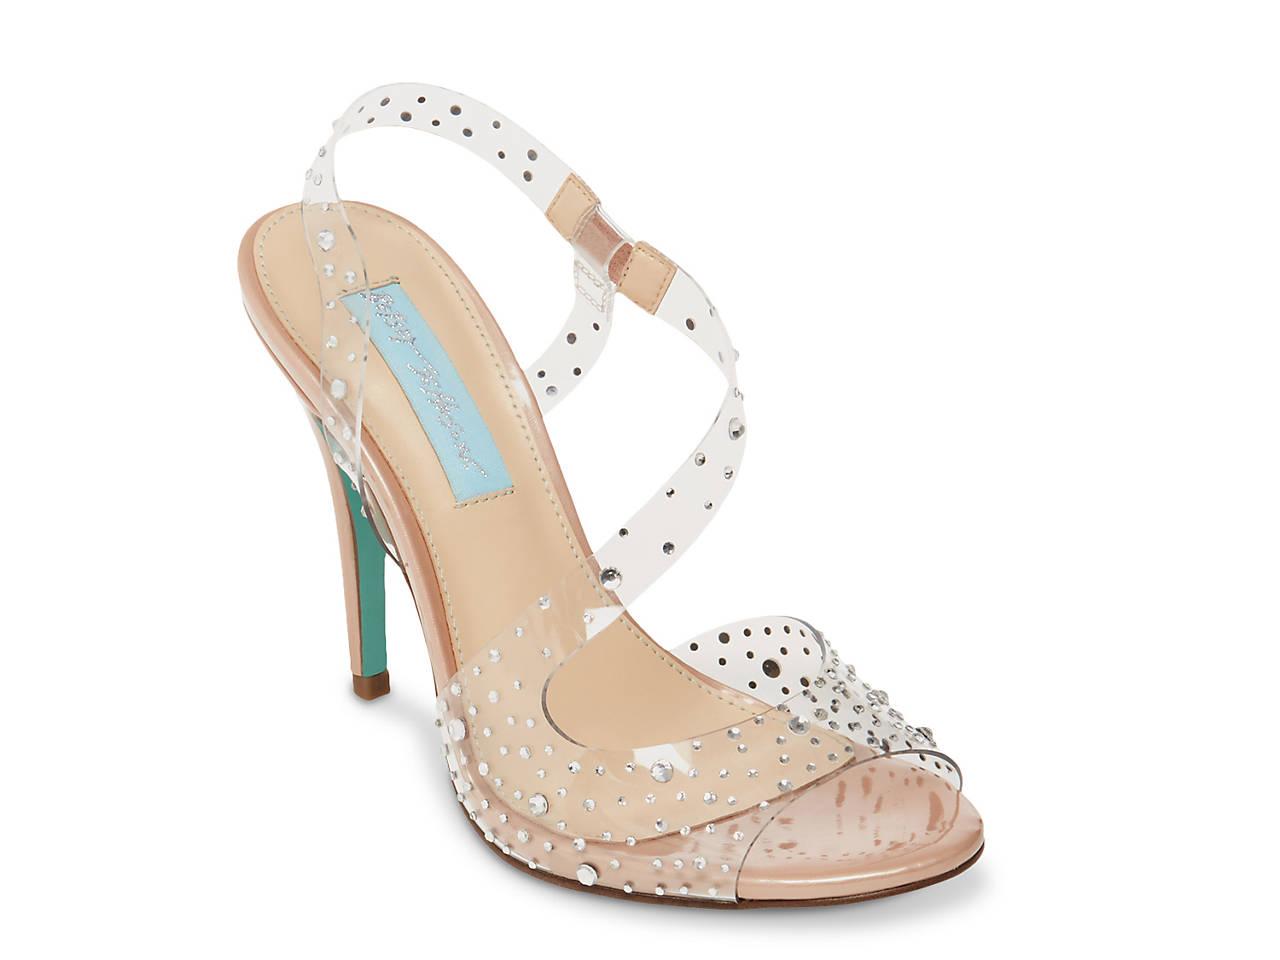 5aae1e3c4 Betsey Johnson Fly Sandal Women s Shoes